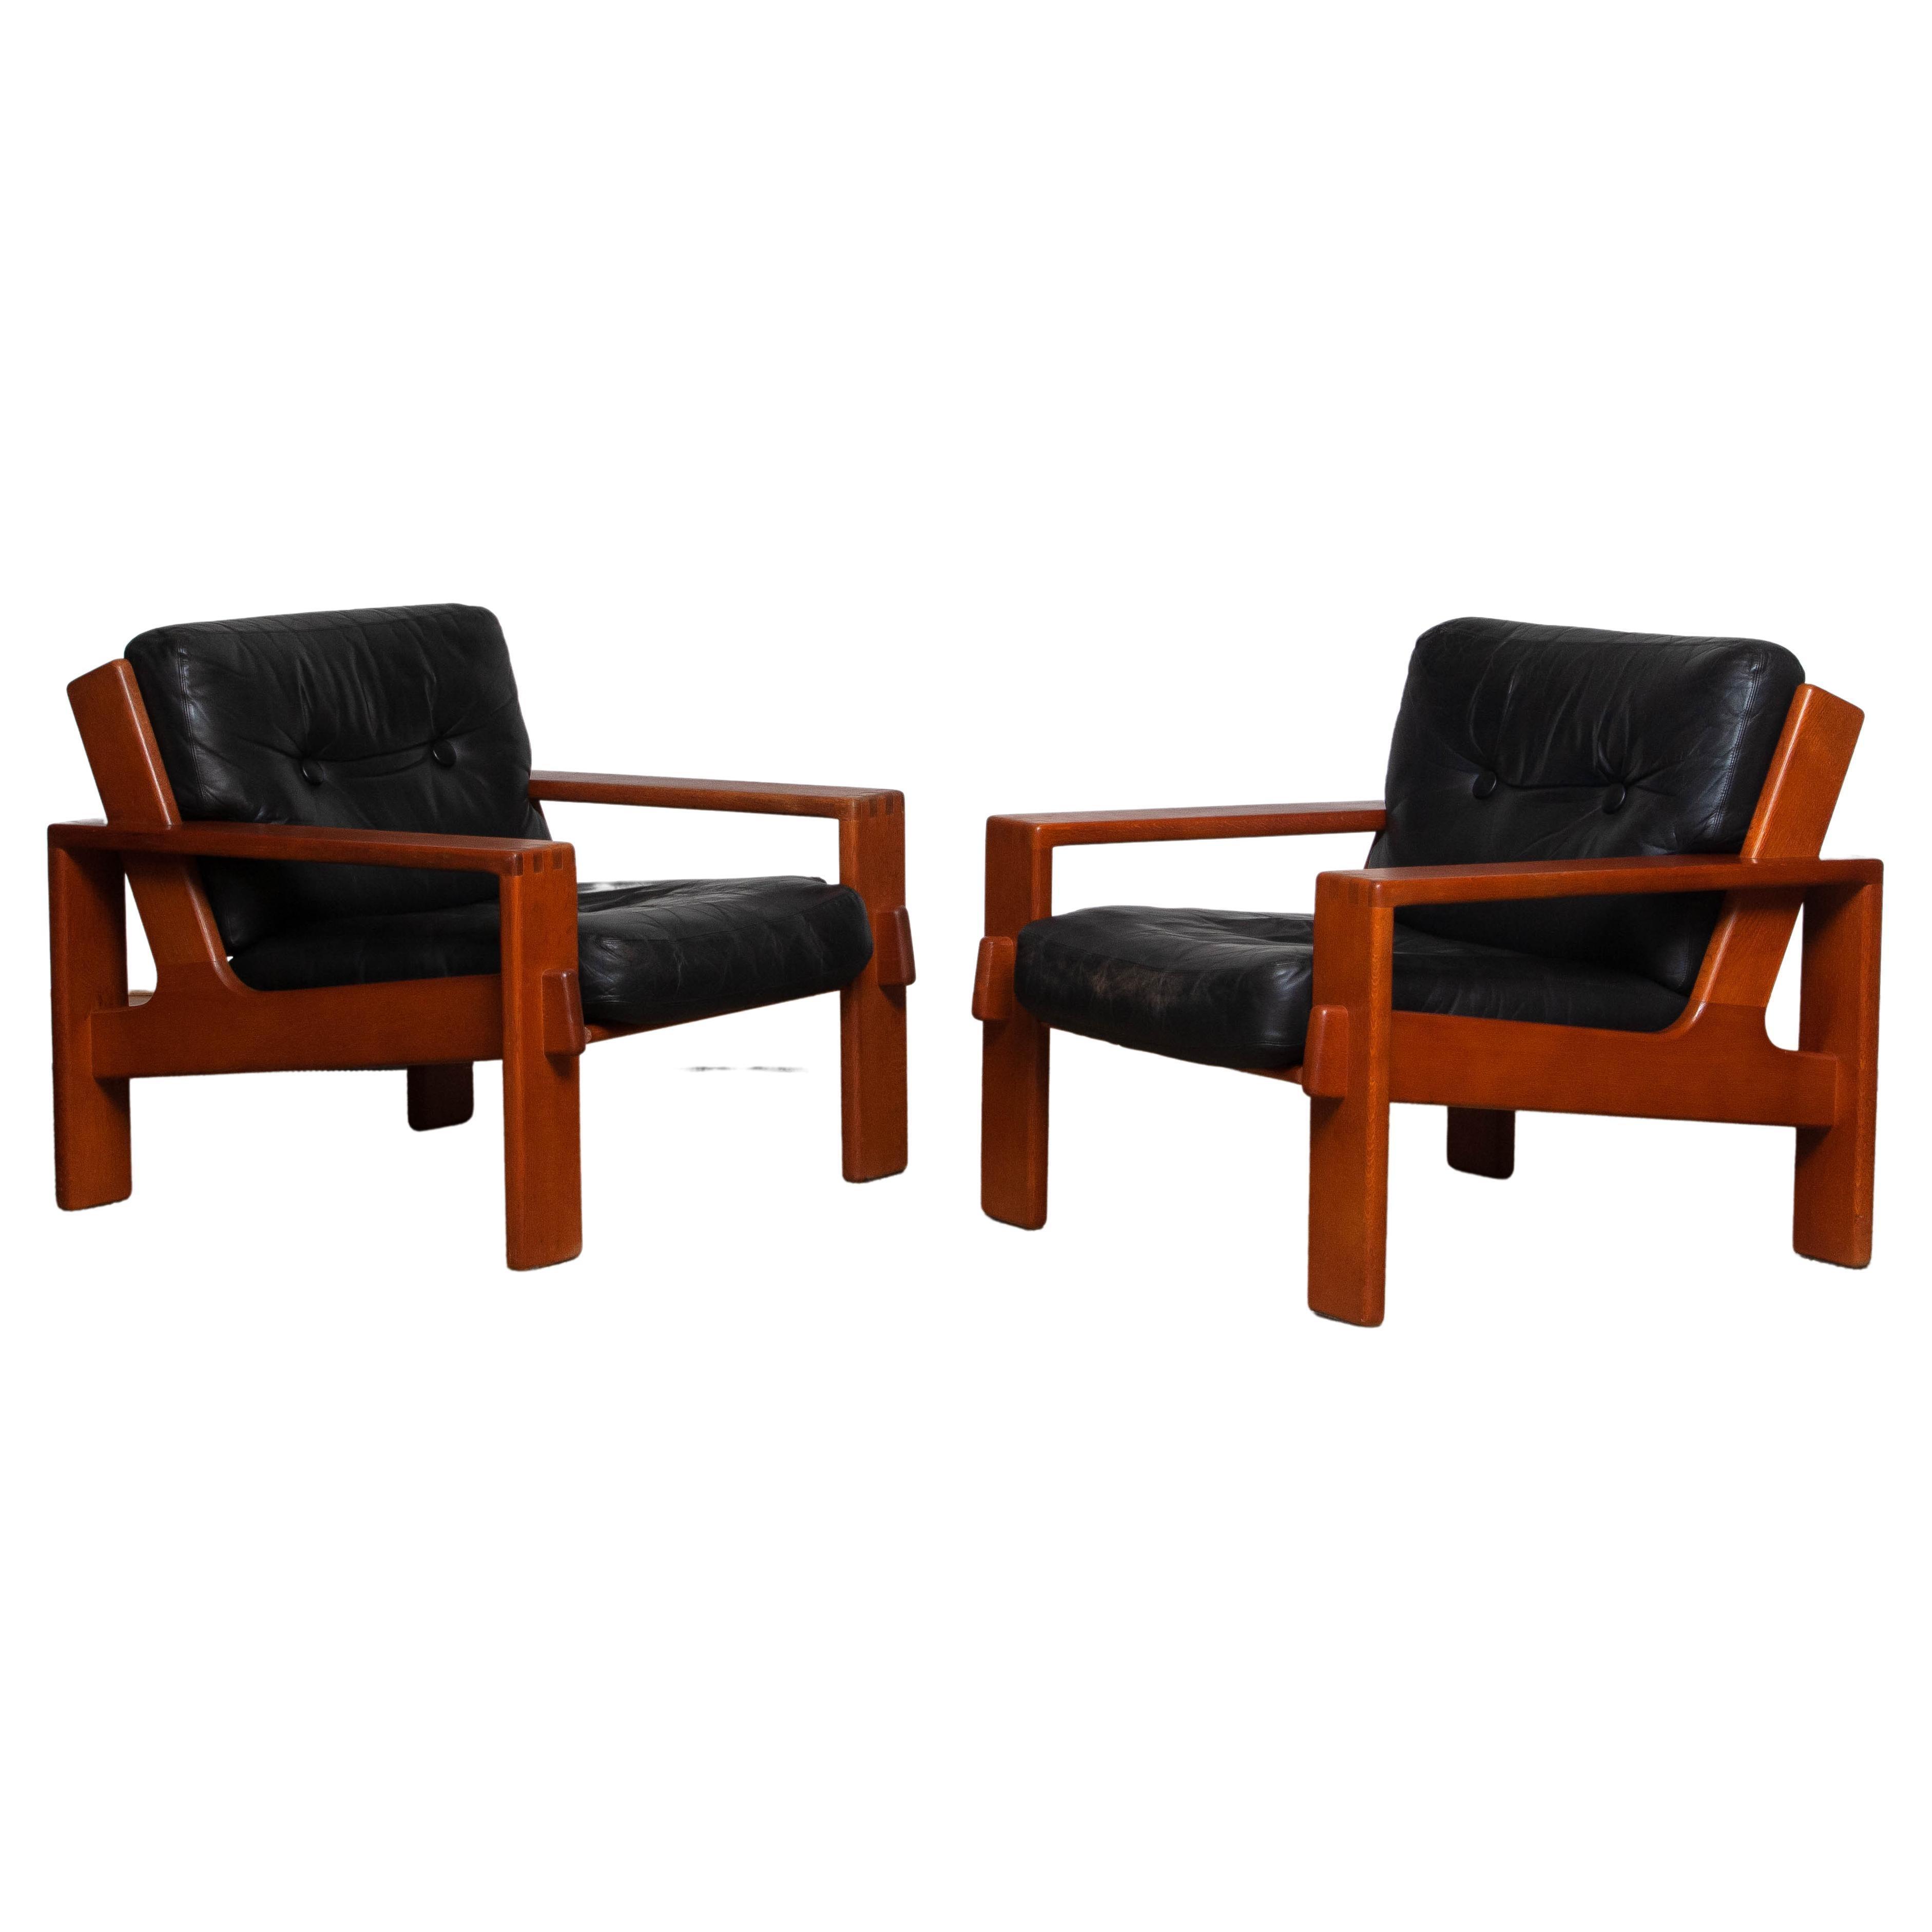 1960 Pair Teak and Black Leather Cubist Lounge Chair by Esko Pajamies for Asko